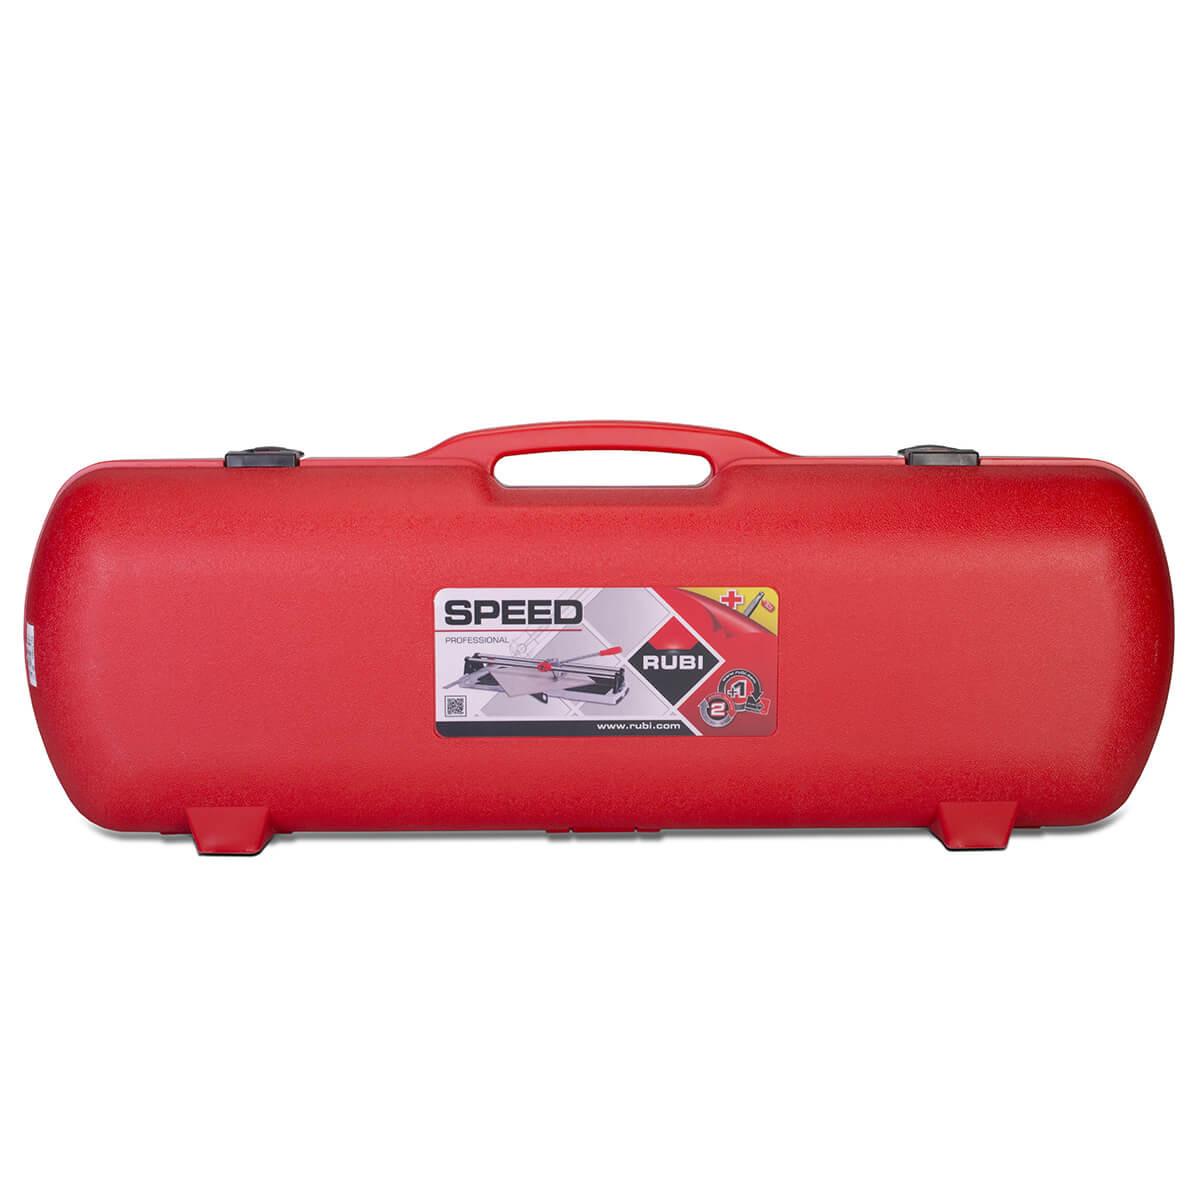 13827 Rubi Speed 62 carrying Case